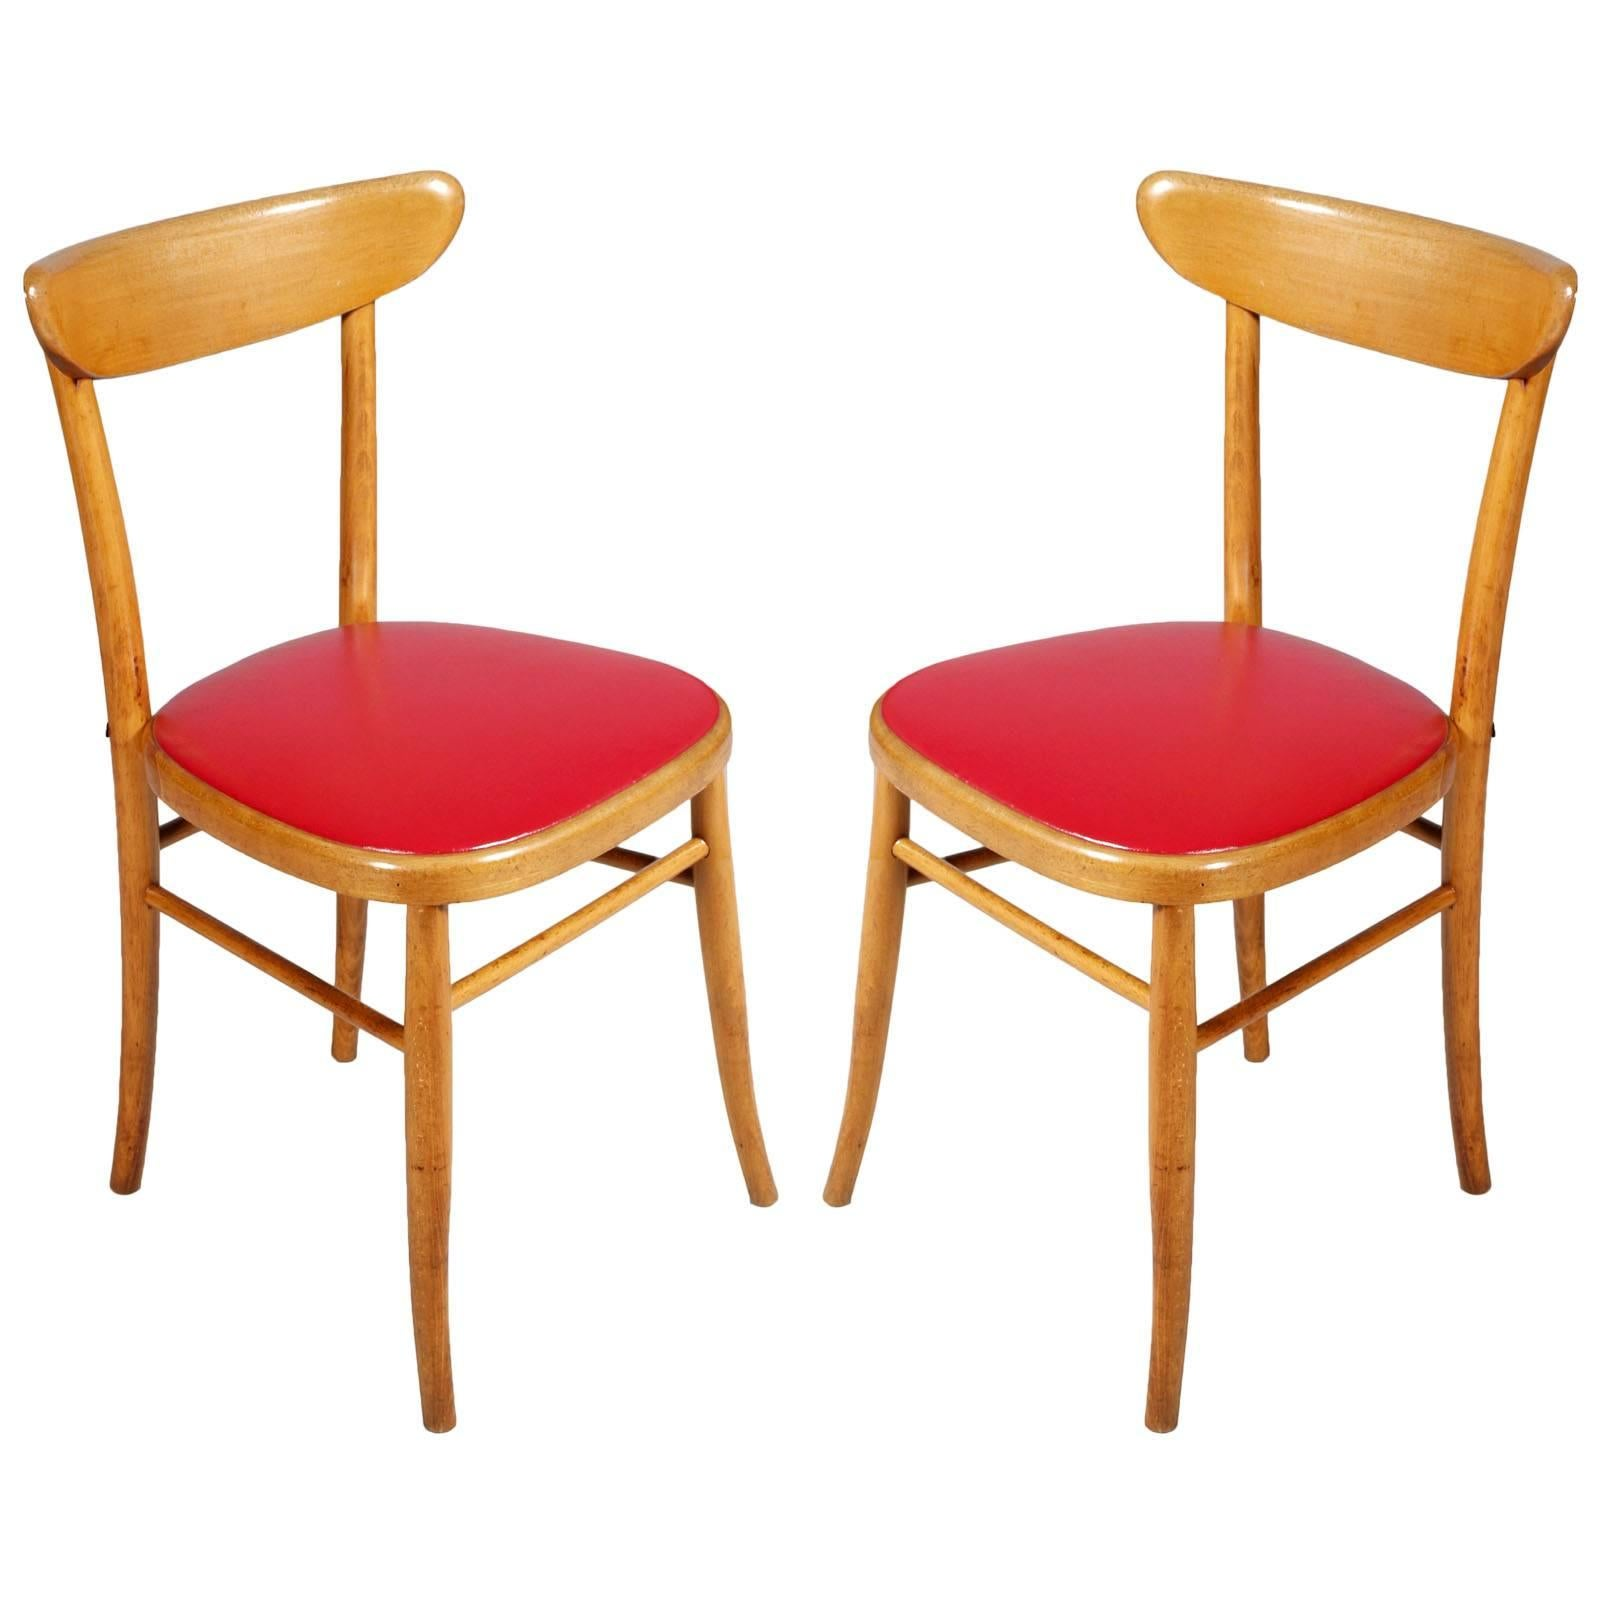 Pair of Italian Midcentury Side Chairs Hans J Wegner manner